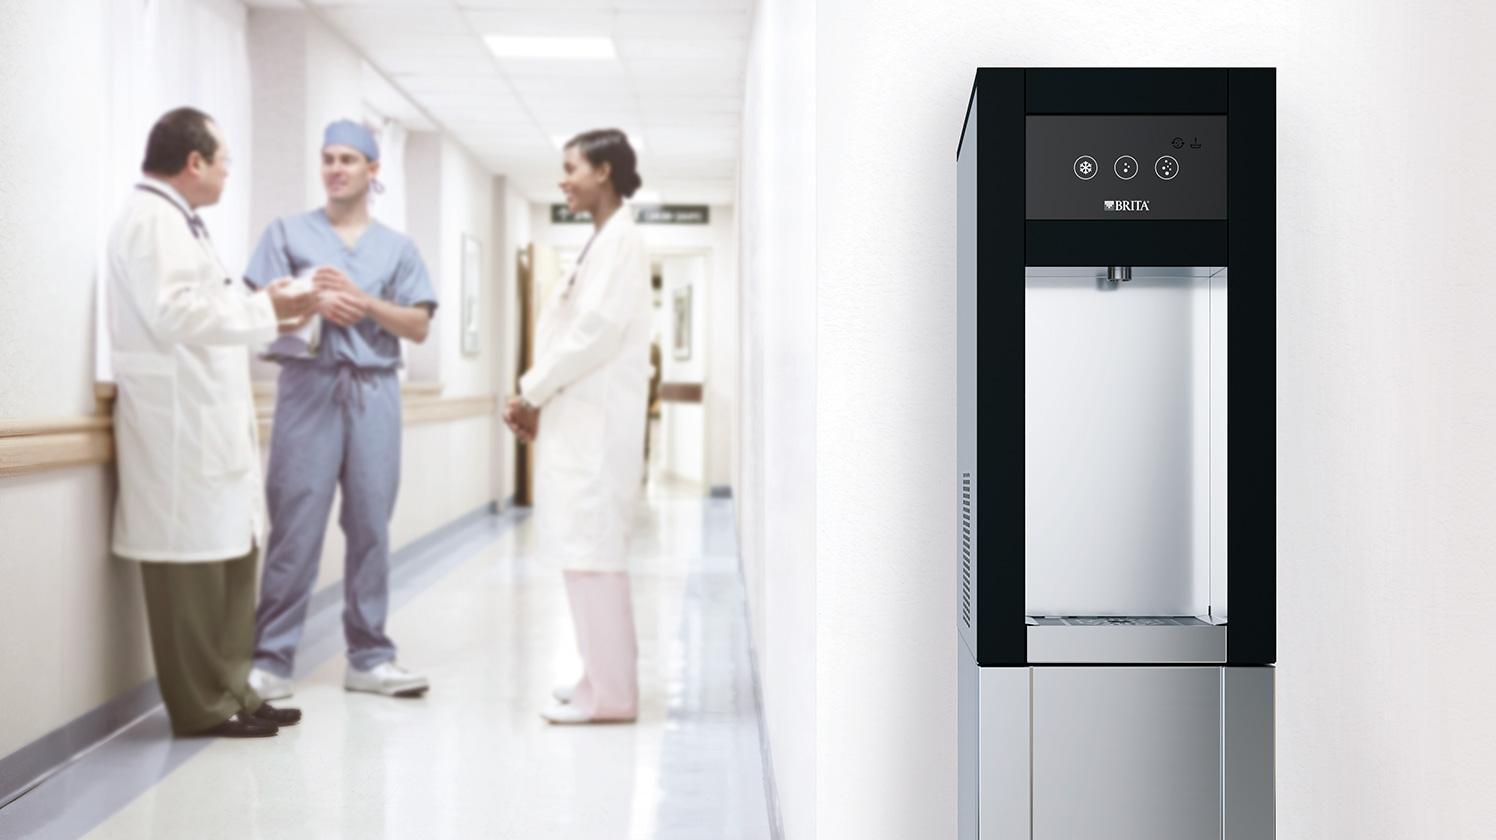 BRITA filter HS1 hospital corridor